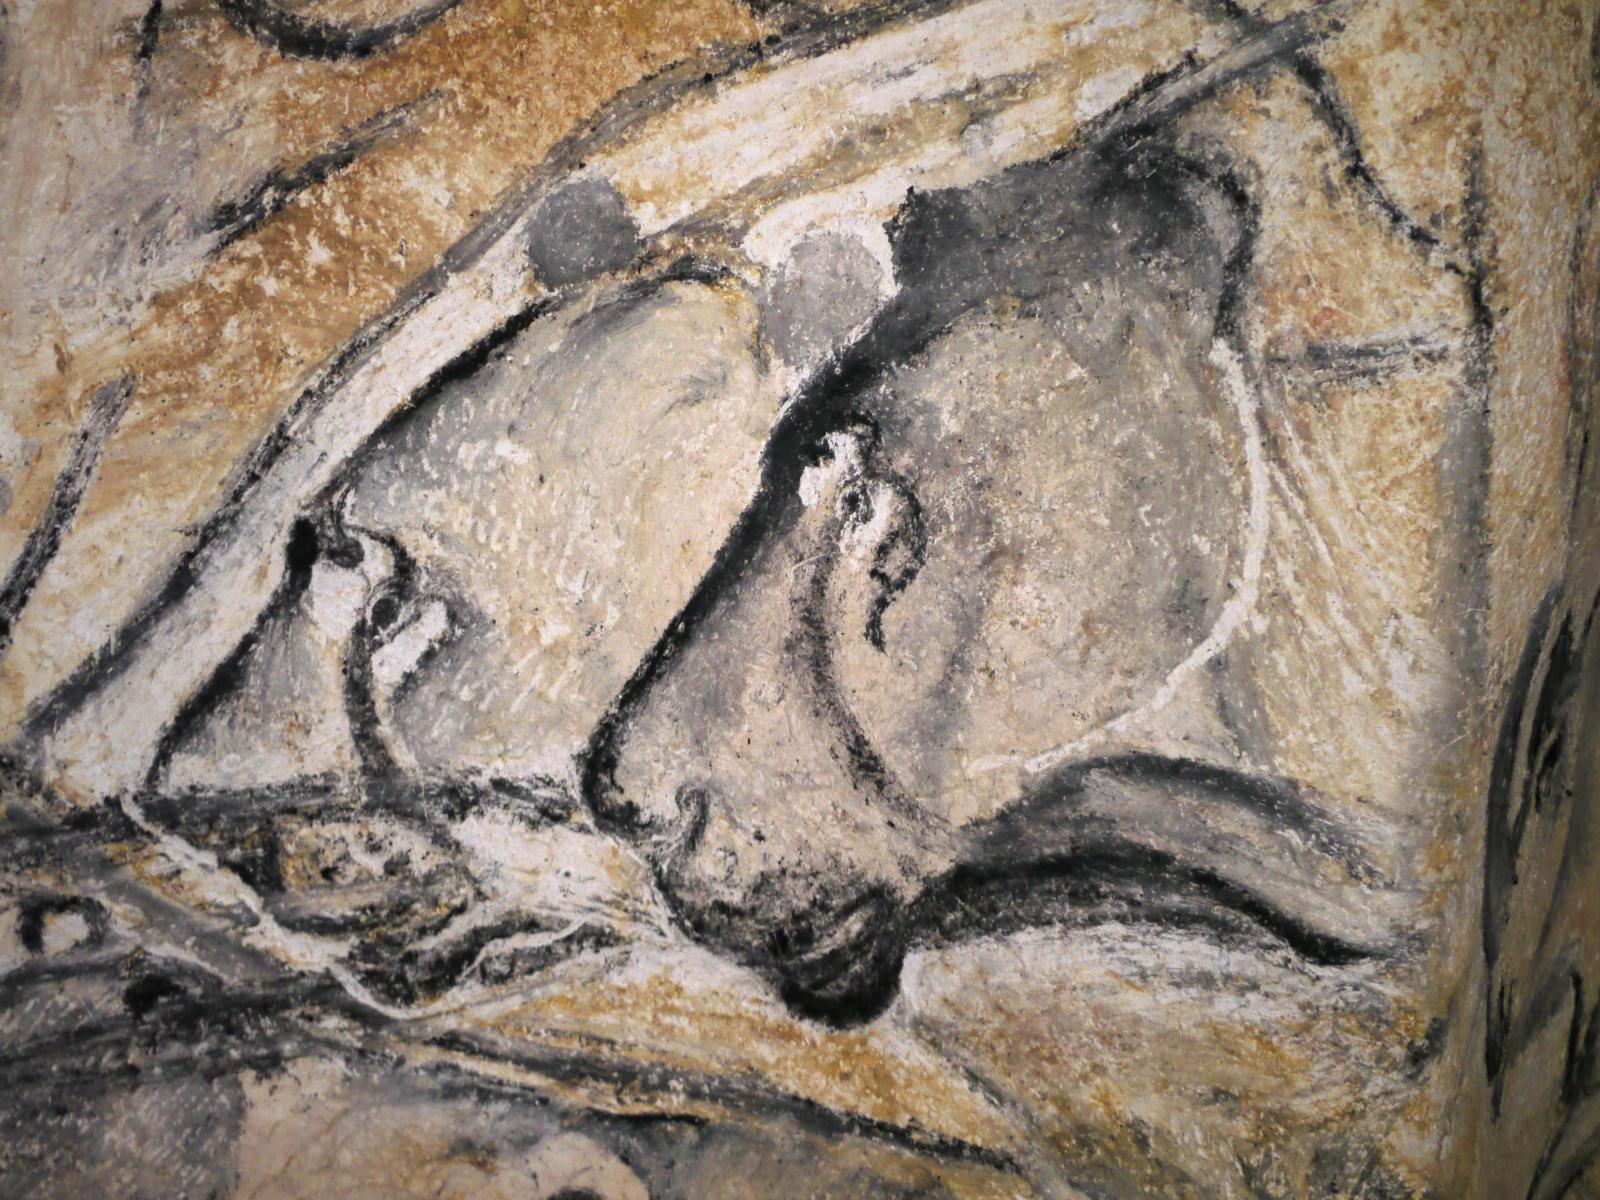 Caverne du Pont d'Arc in de Ardèche, onderdompeling in de prehistorie